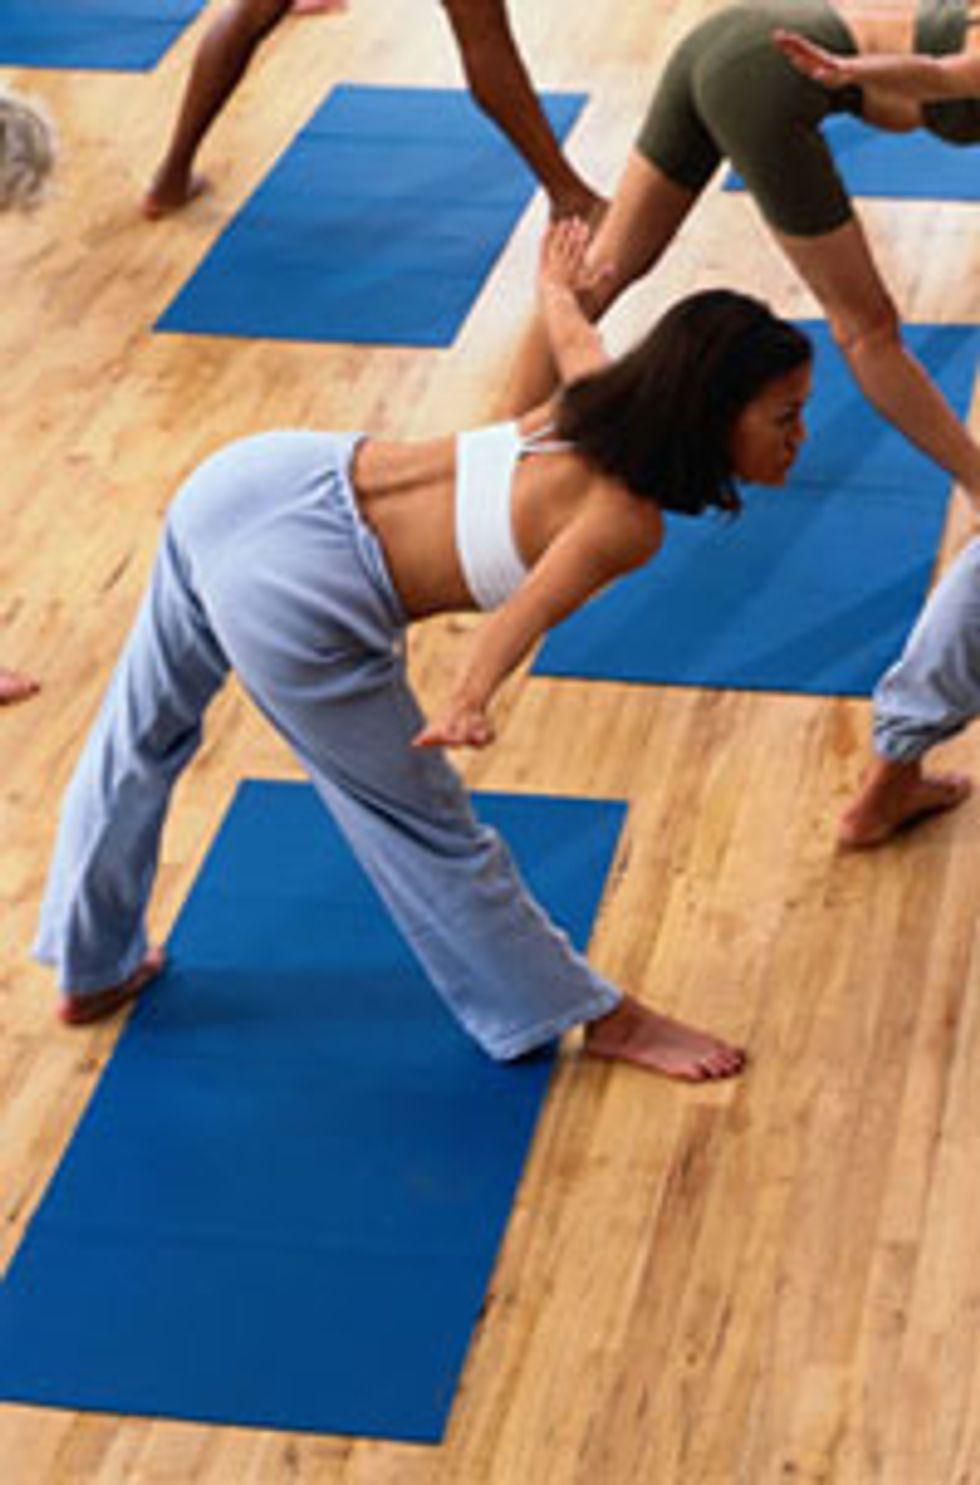 yoga-747996.jpg